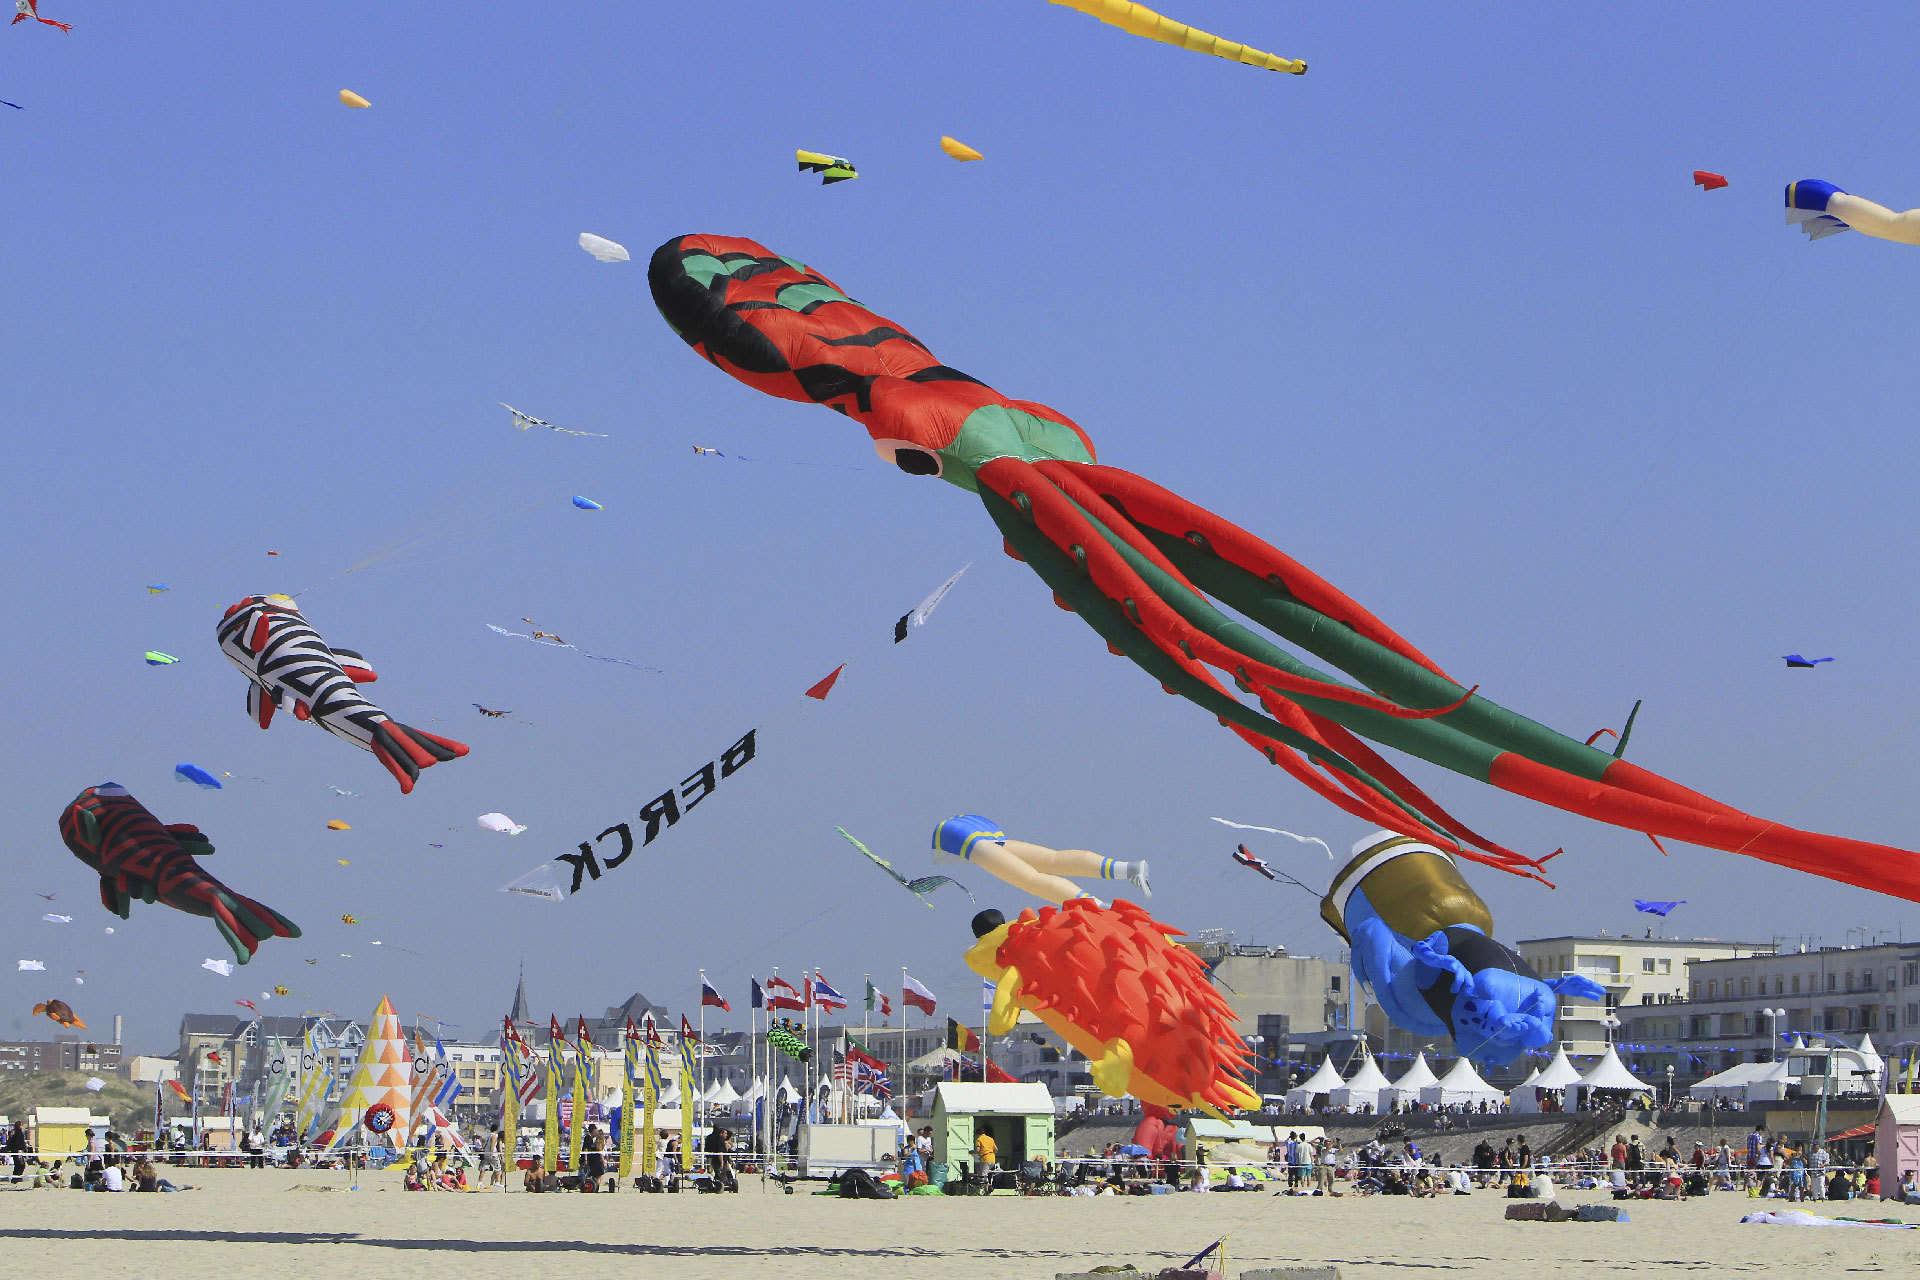 festival de cerf volant